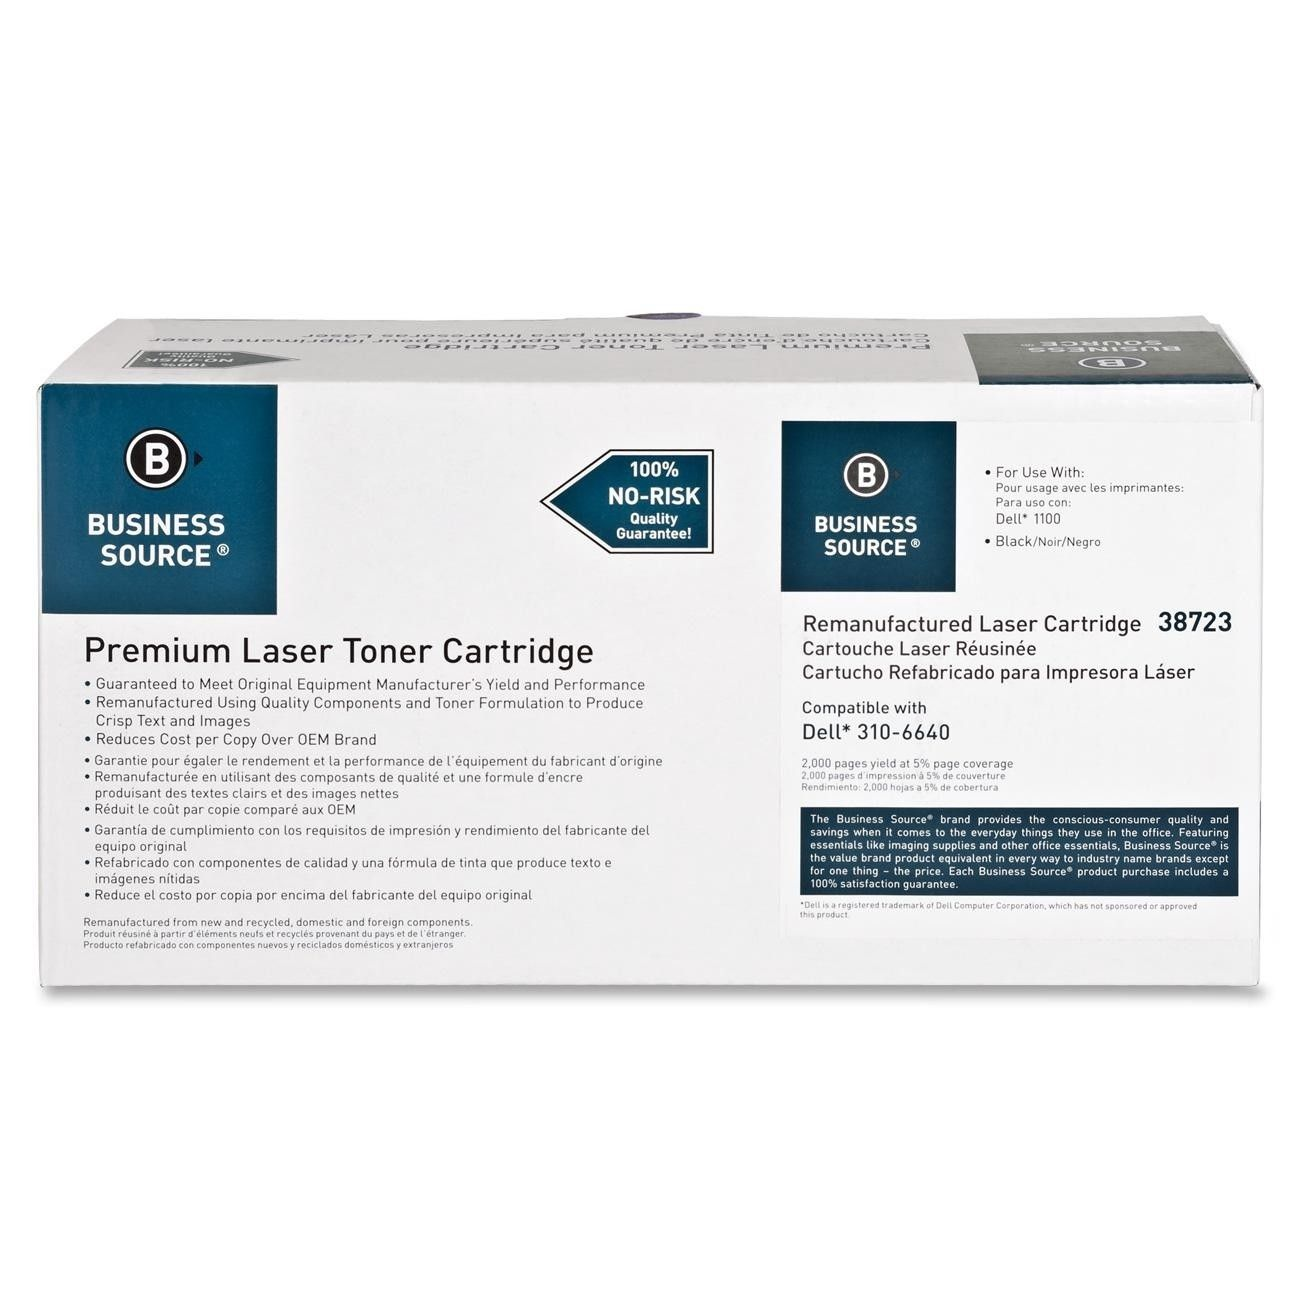 Toner Cartridge 2000 Page Yield Black Products Pinterest Tinta Canon Noir 1 Liter